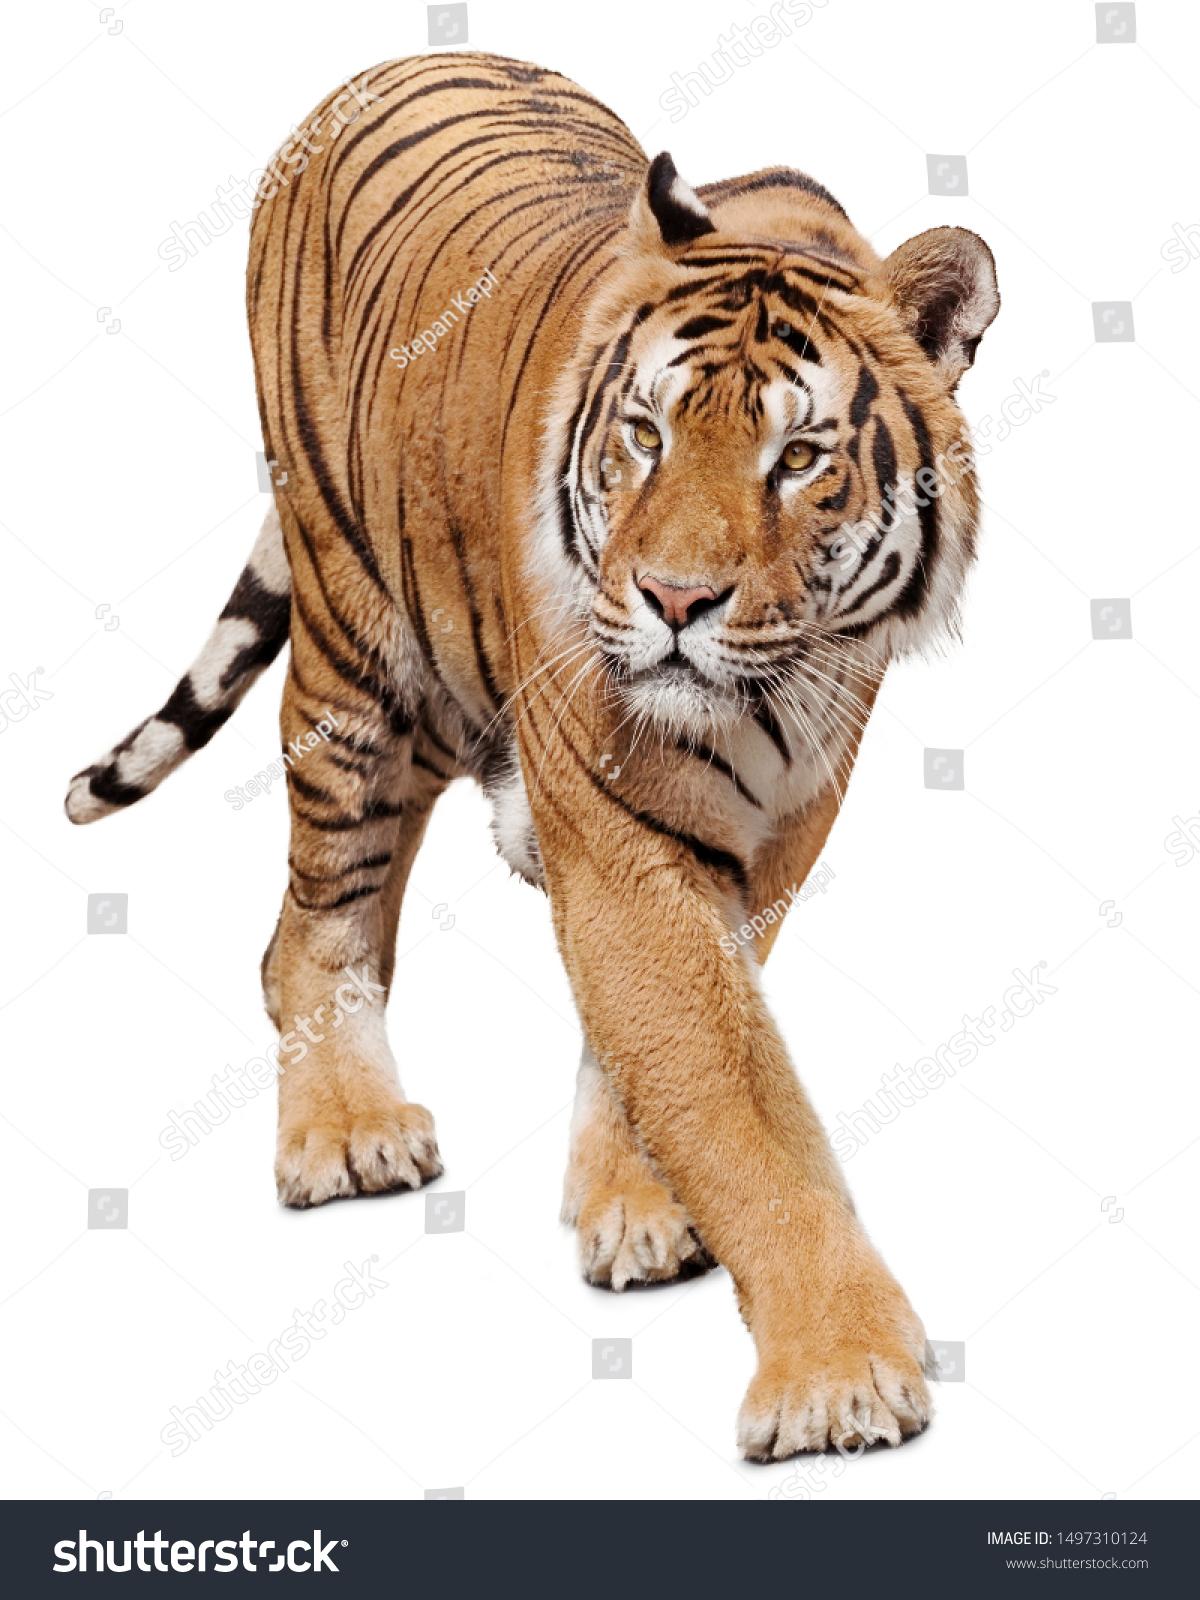 Tiger walking on white background #1497310124